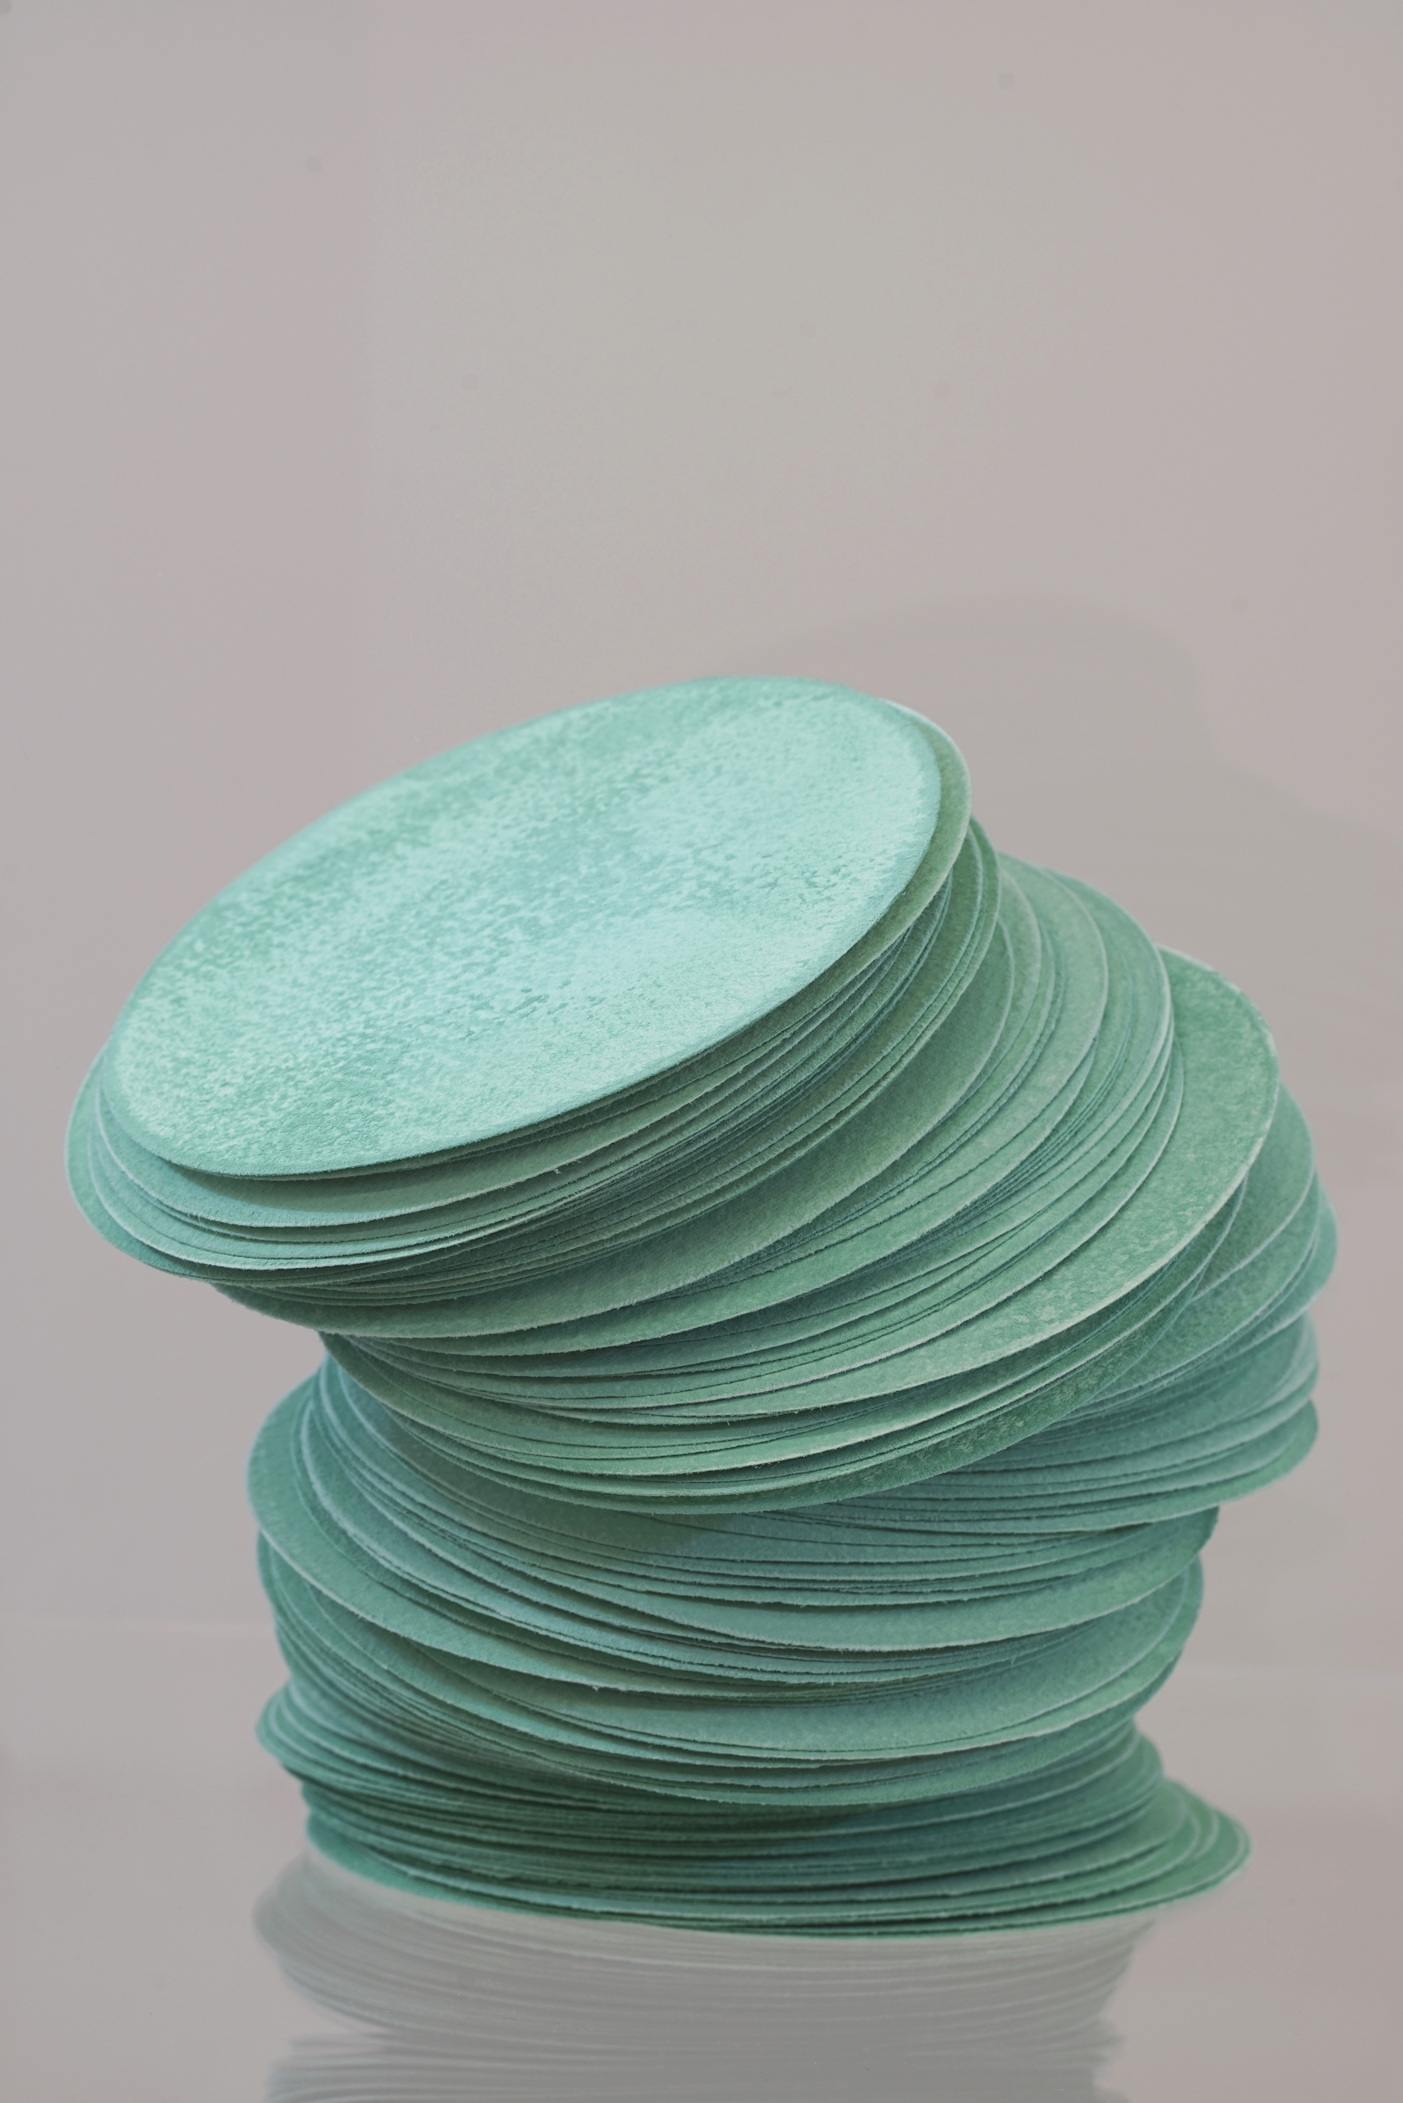 Grace TAN  n. 326 - carbonation  2015 Acid-free cotton pulp watercolour paper, Matsurokusho (malachite mineral pigment), archival EVA glue and nikawa (cow hide glue) H20 x W20 x D20 cm (artwork) H133 x W35 x D35 cm (plinth and case)